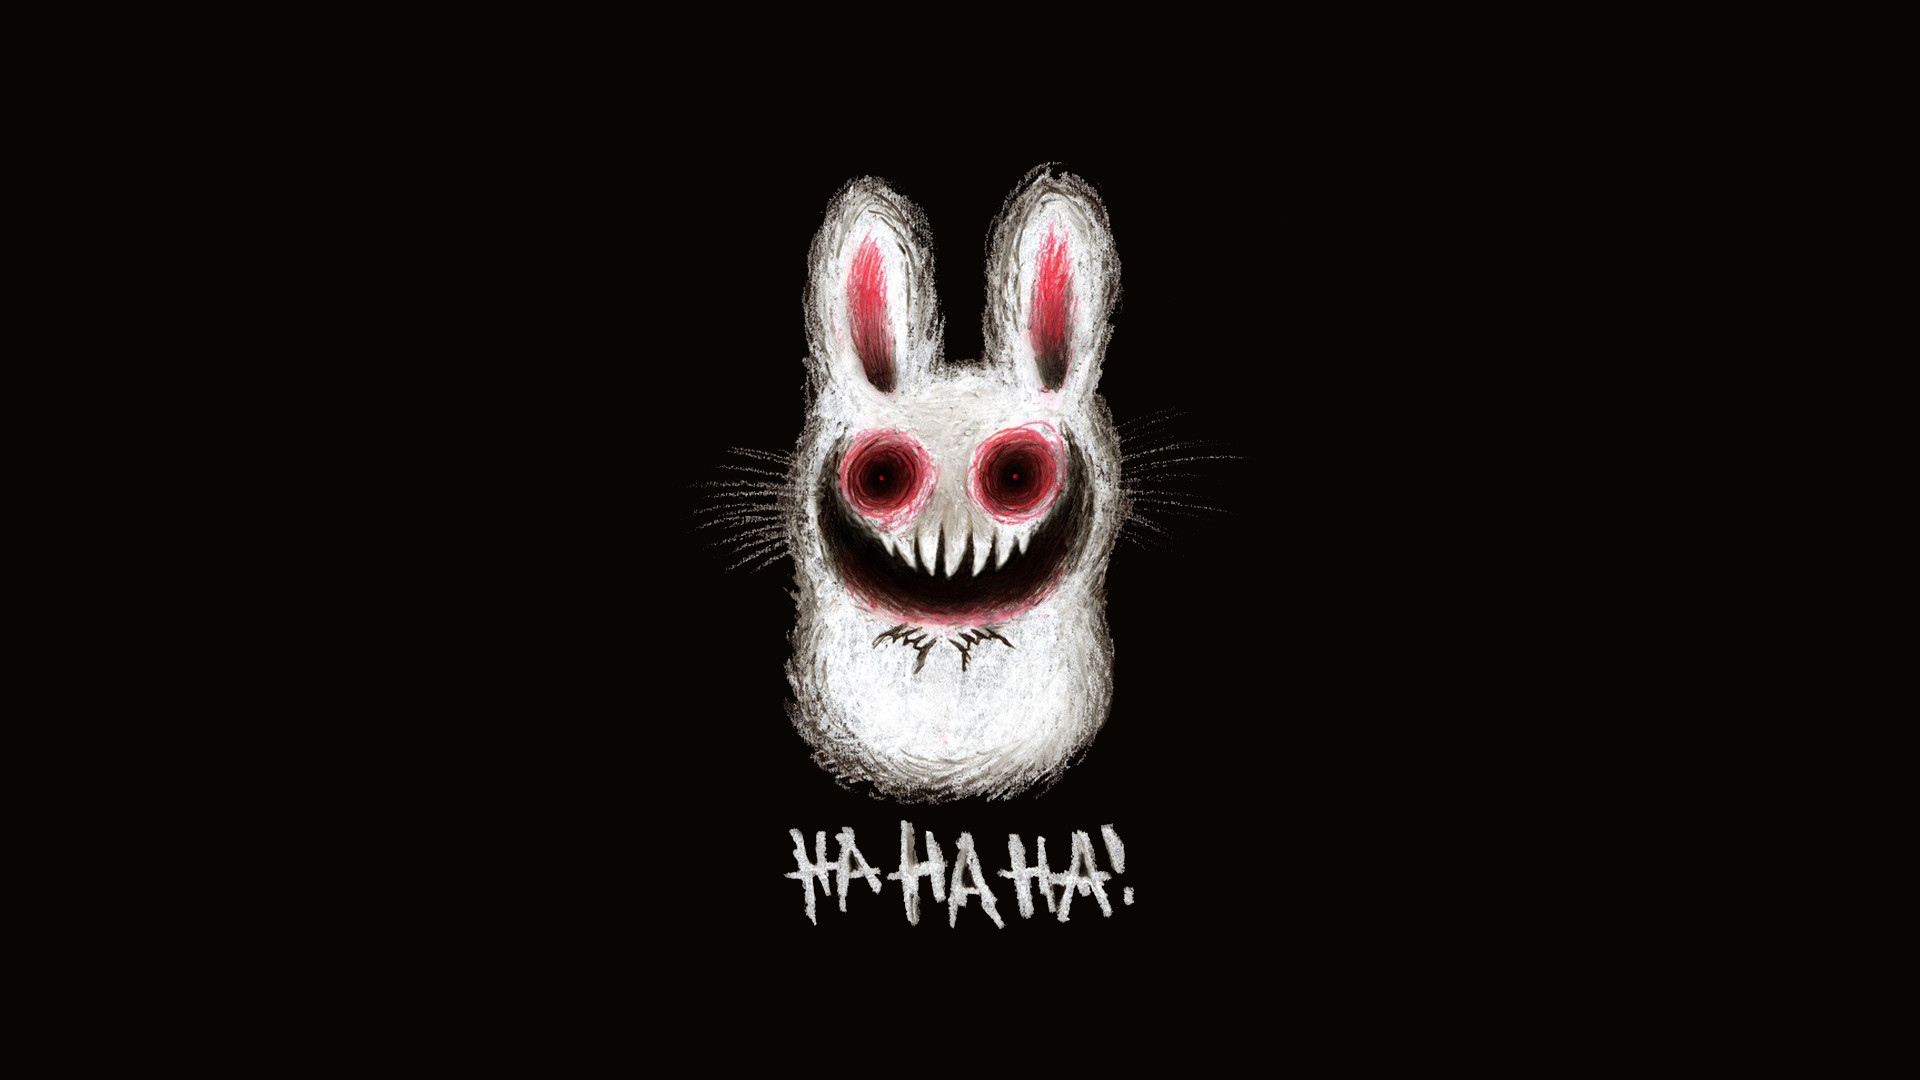 Creepy bunny wallpaper, cute adorable fluffy scary bunny rabbit .